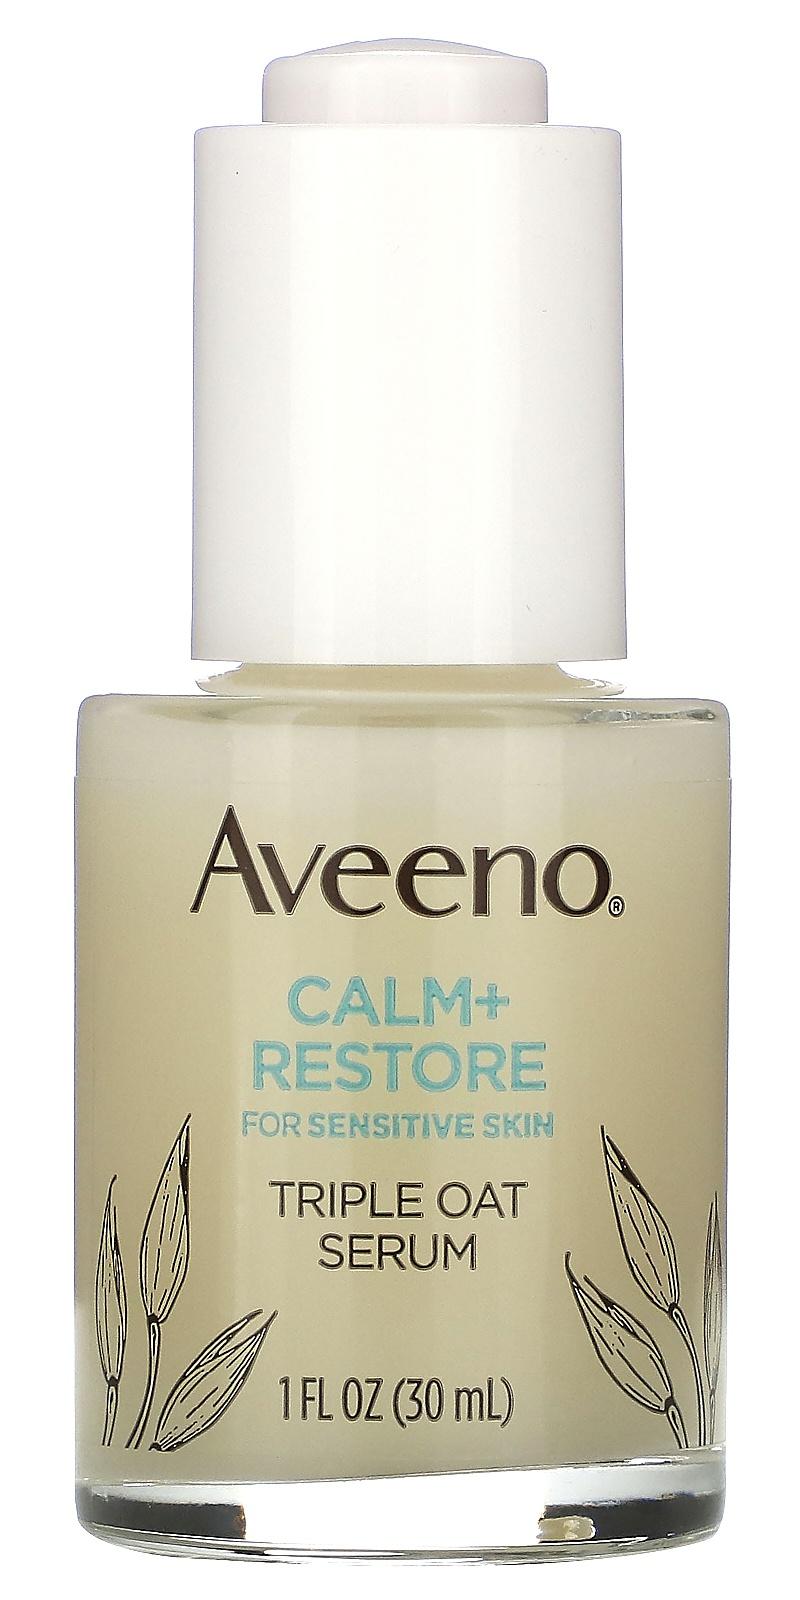 Aveeno Calm+ Restore Triple Oat Serum